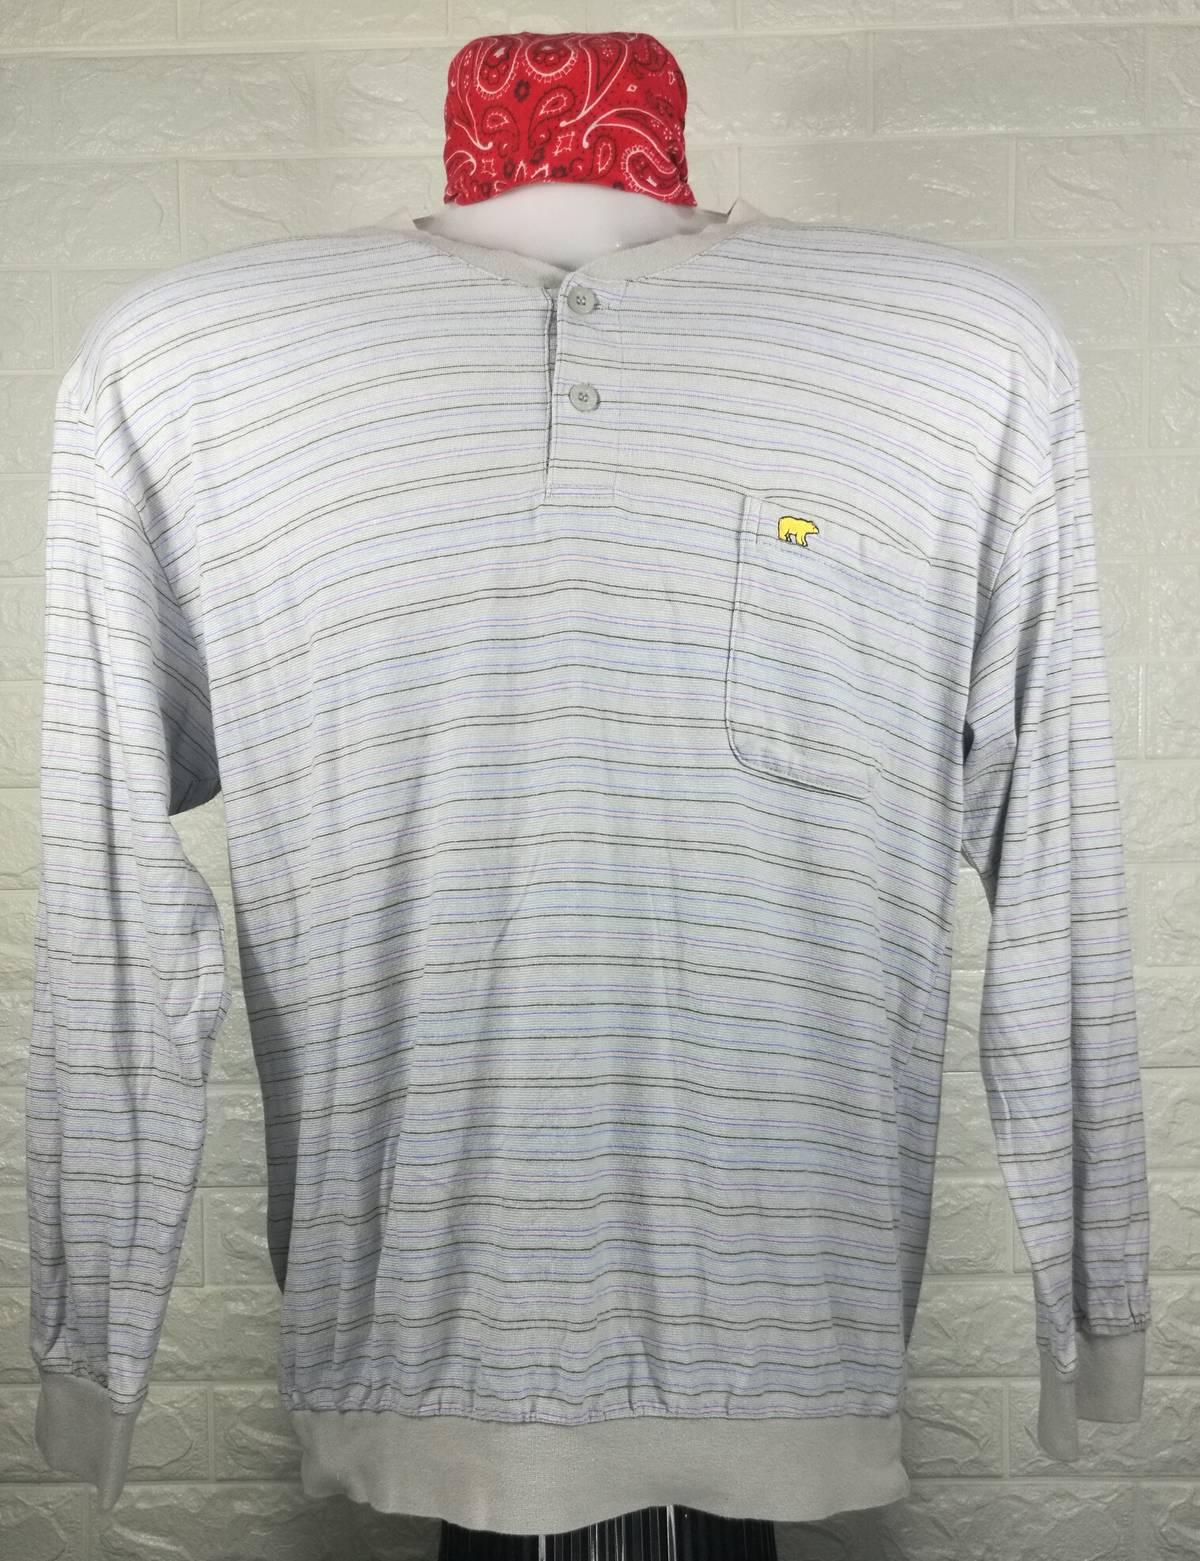 Vintage GOLDEN BEAR Polo Shirt Men Large 90/'s Golden Bear Single Pocket Long Sleeves Shirt Golden Bear Stripes Multicolor Shirt Men Size L